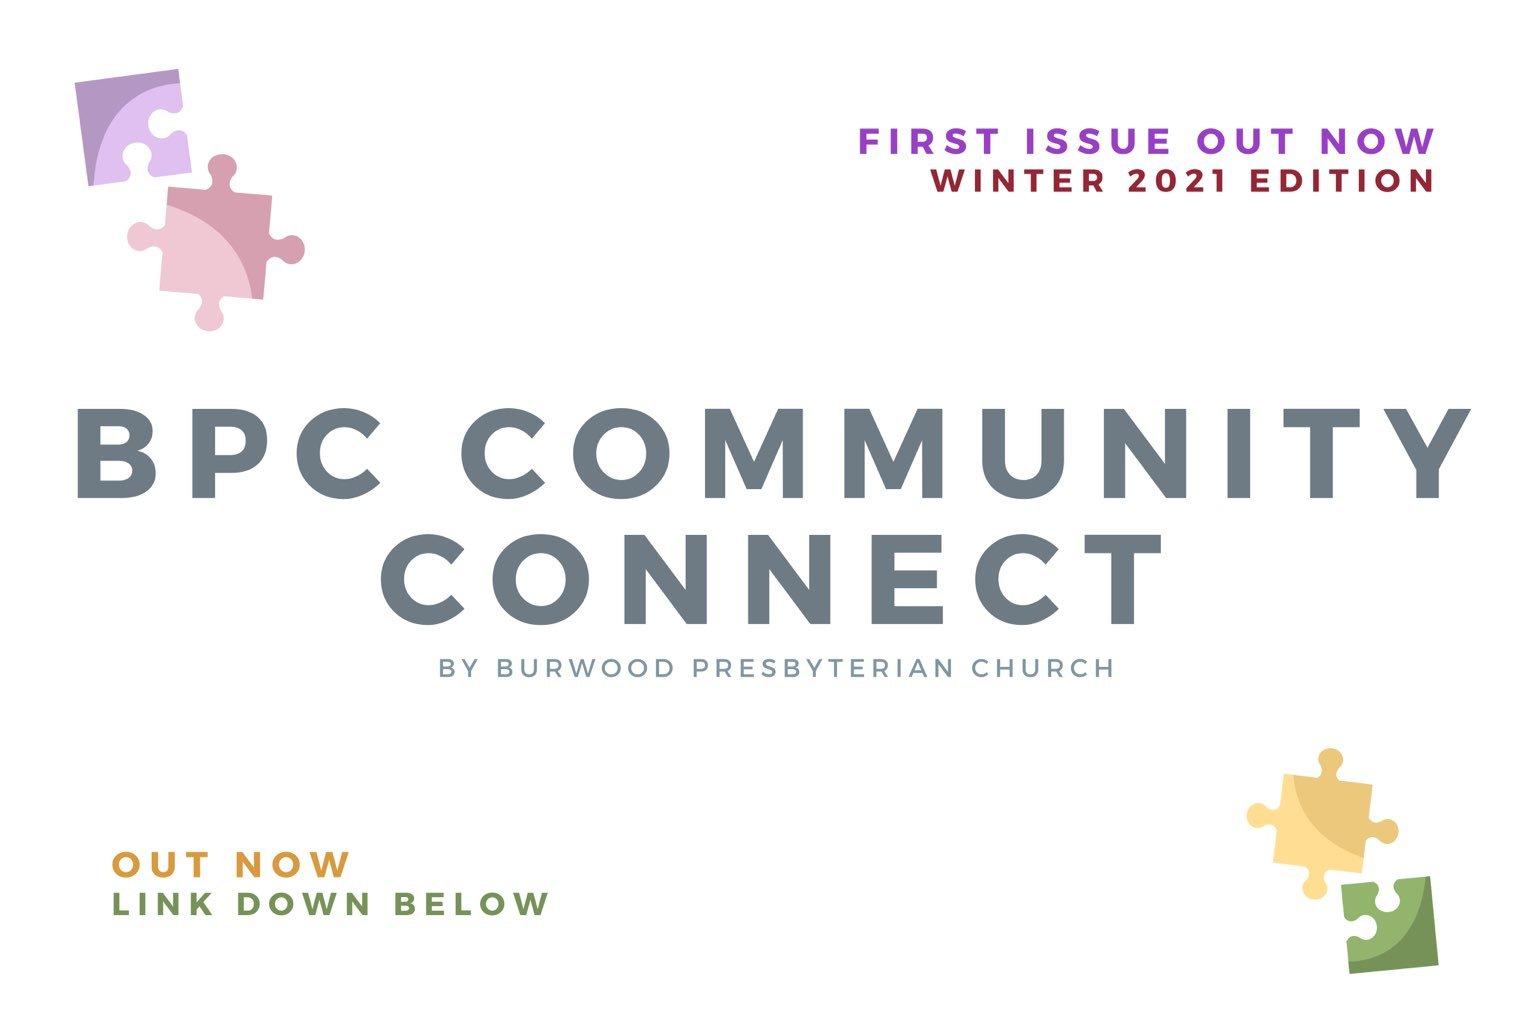 BPC Community Connect